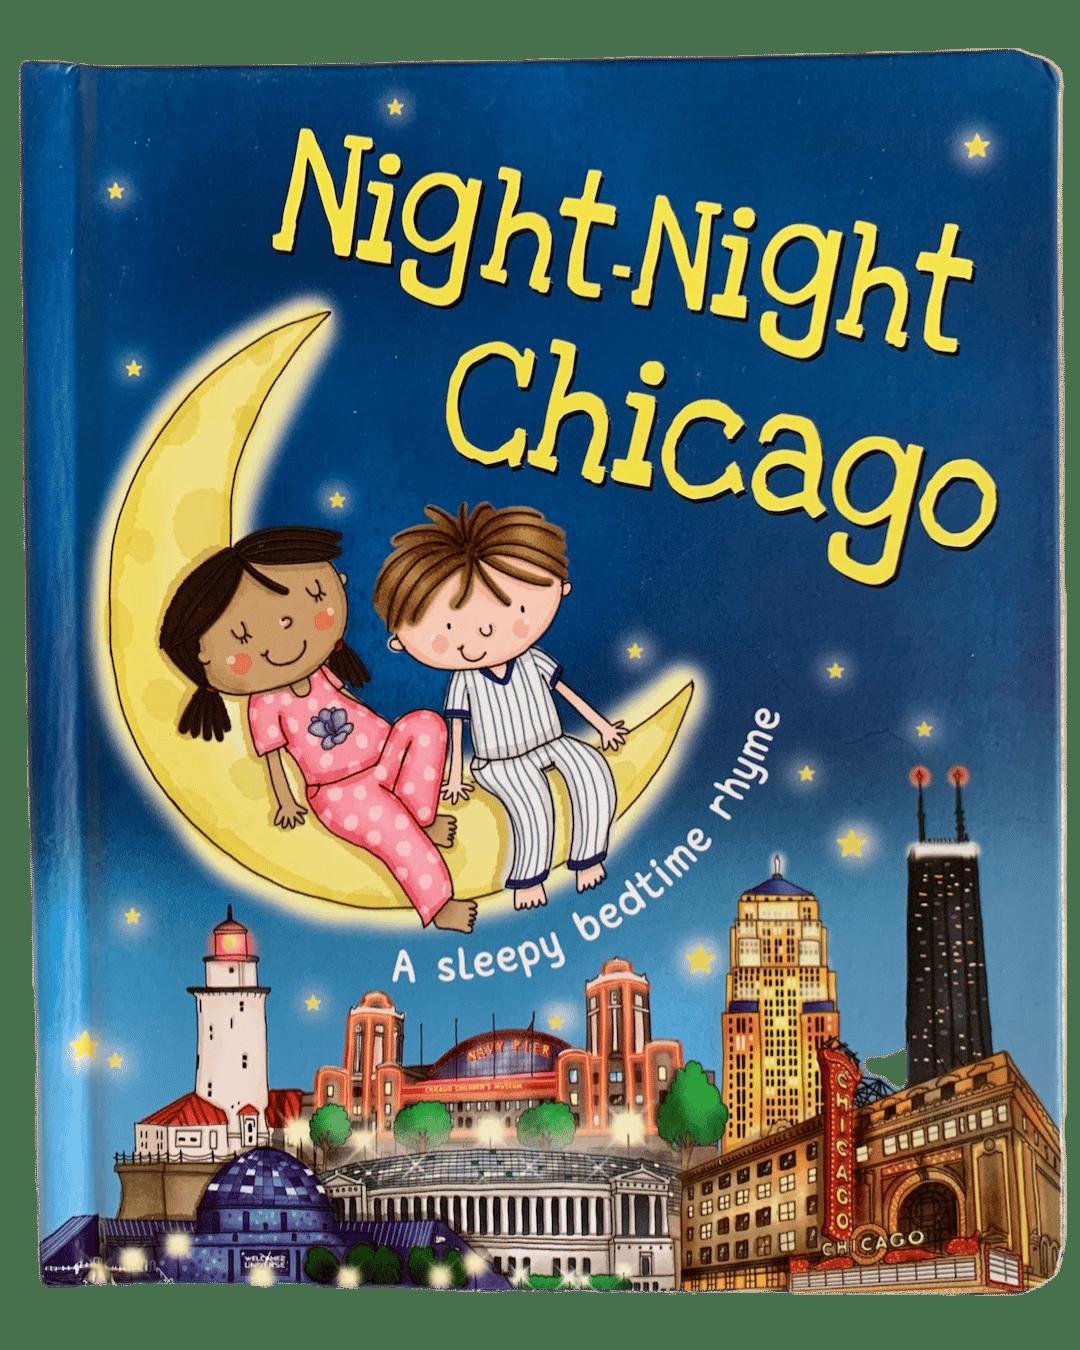 Night night Chicago